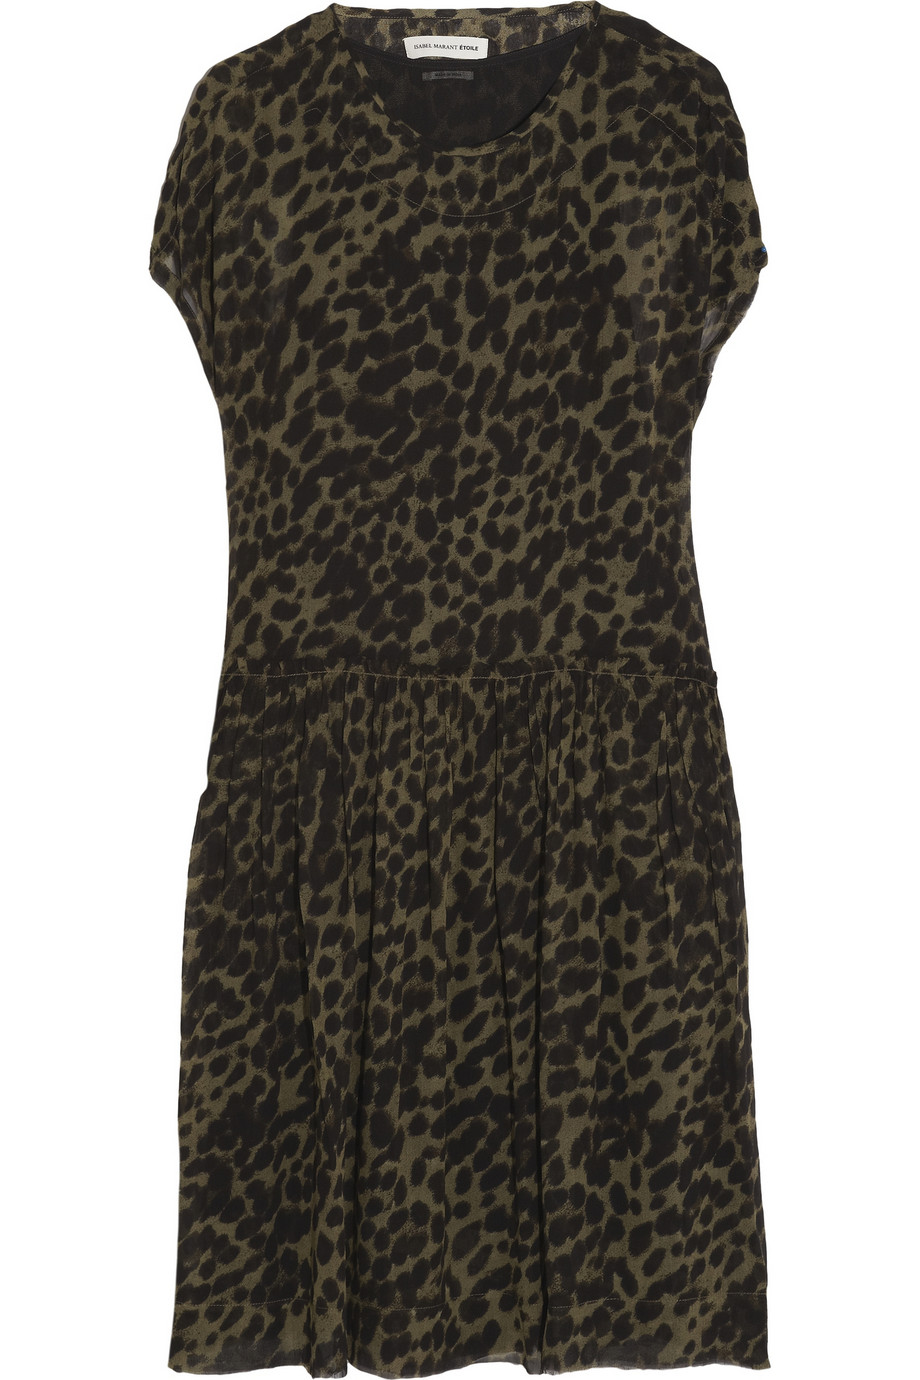 ÉTOILE ISABEL MARANTCalesi leopard-print crepe dress,$485,  net-a-porter.com